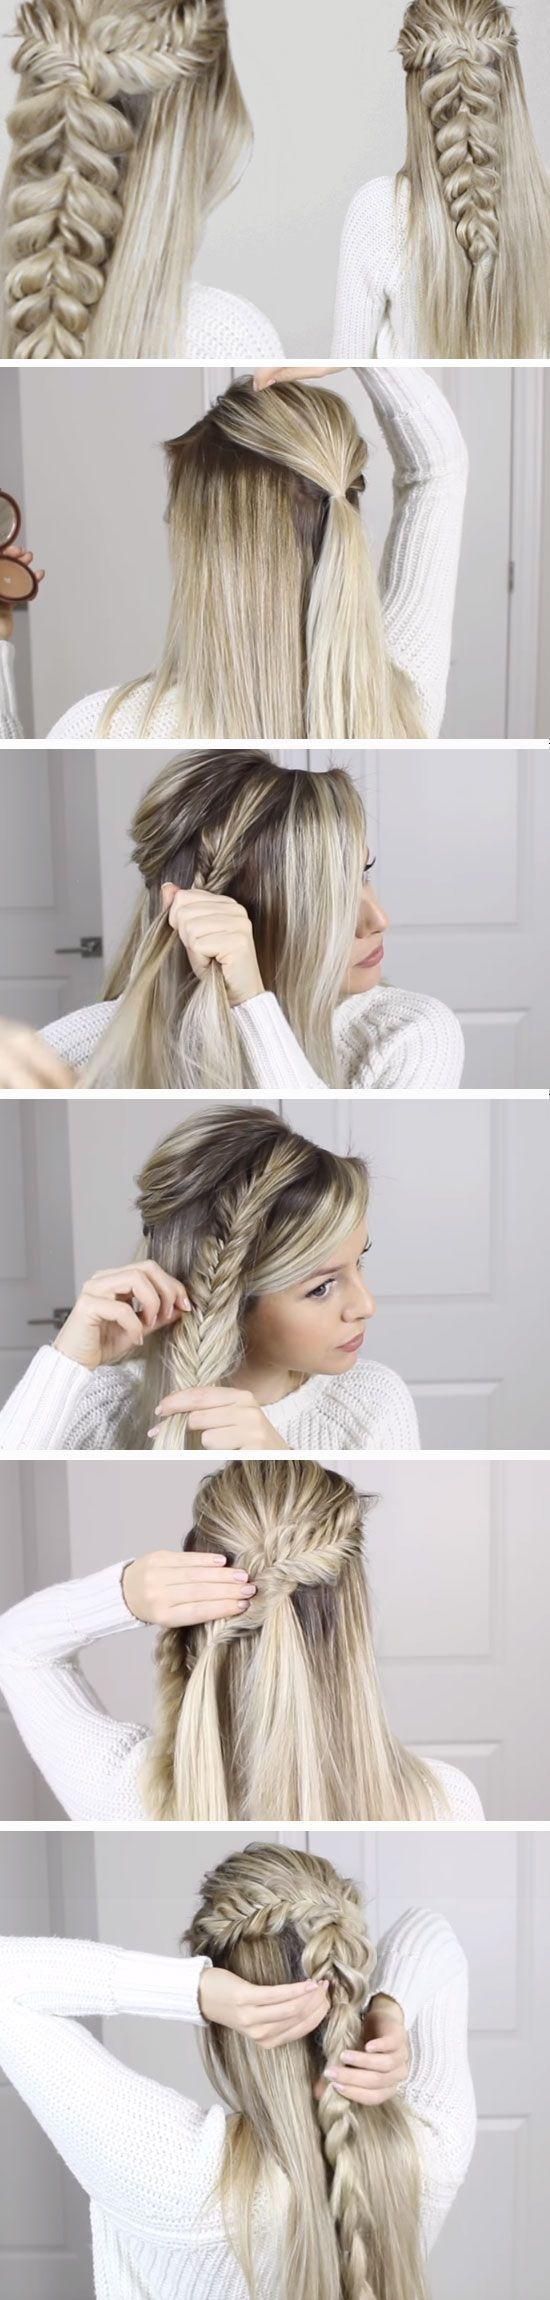 Fishtail into Pull Through Braid   DIY Wedding Hairstyles for Medium ...